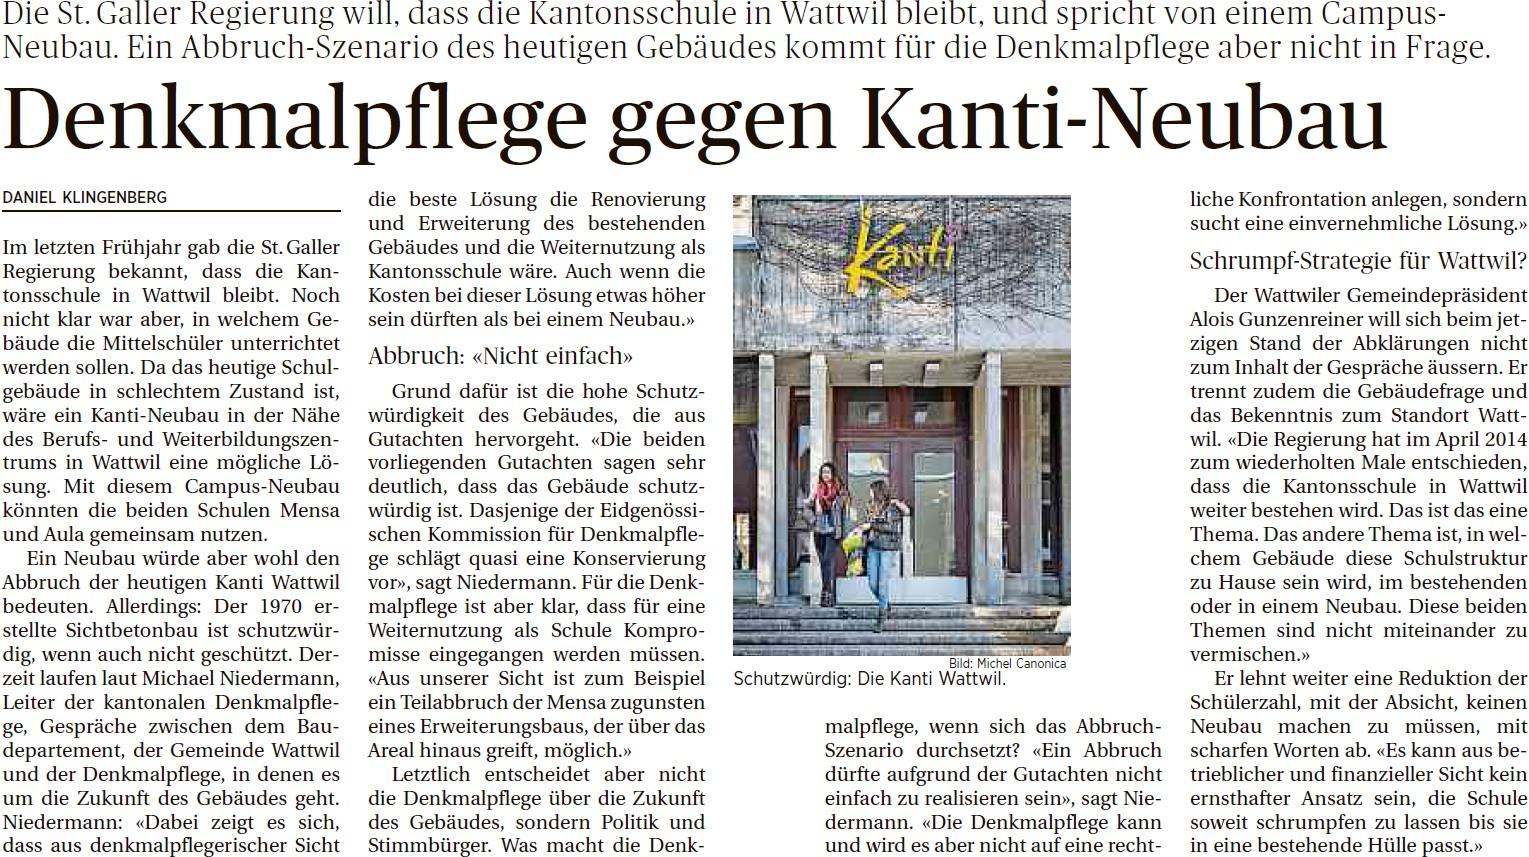 Denkmalpflege gegen Kanti-Neubau (Sonntag, 15.02.2015)